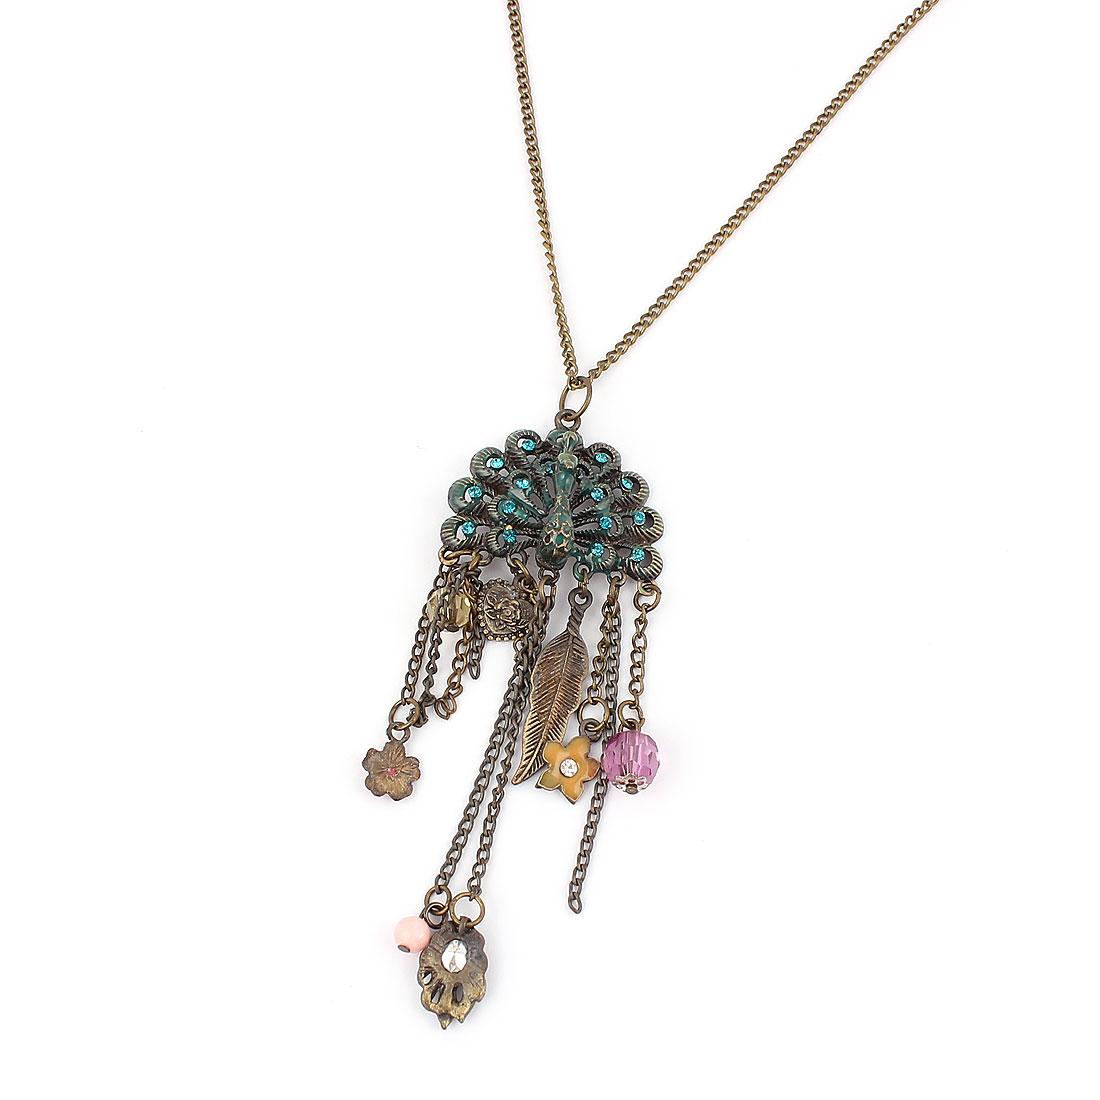 Women Fashion Jewelry Vintage Style Rhinestone Peacock Pendant Necklace Bronze Tone